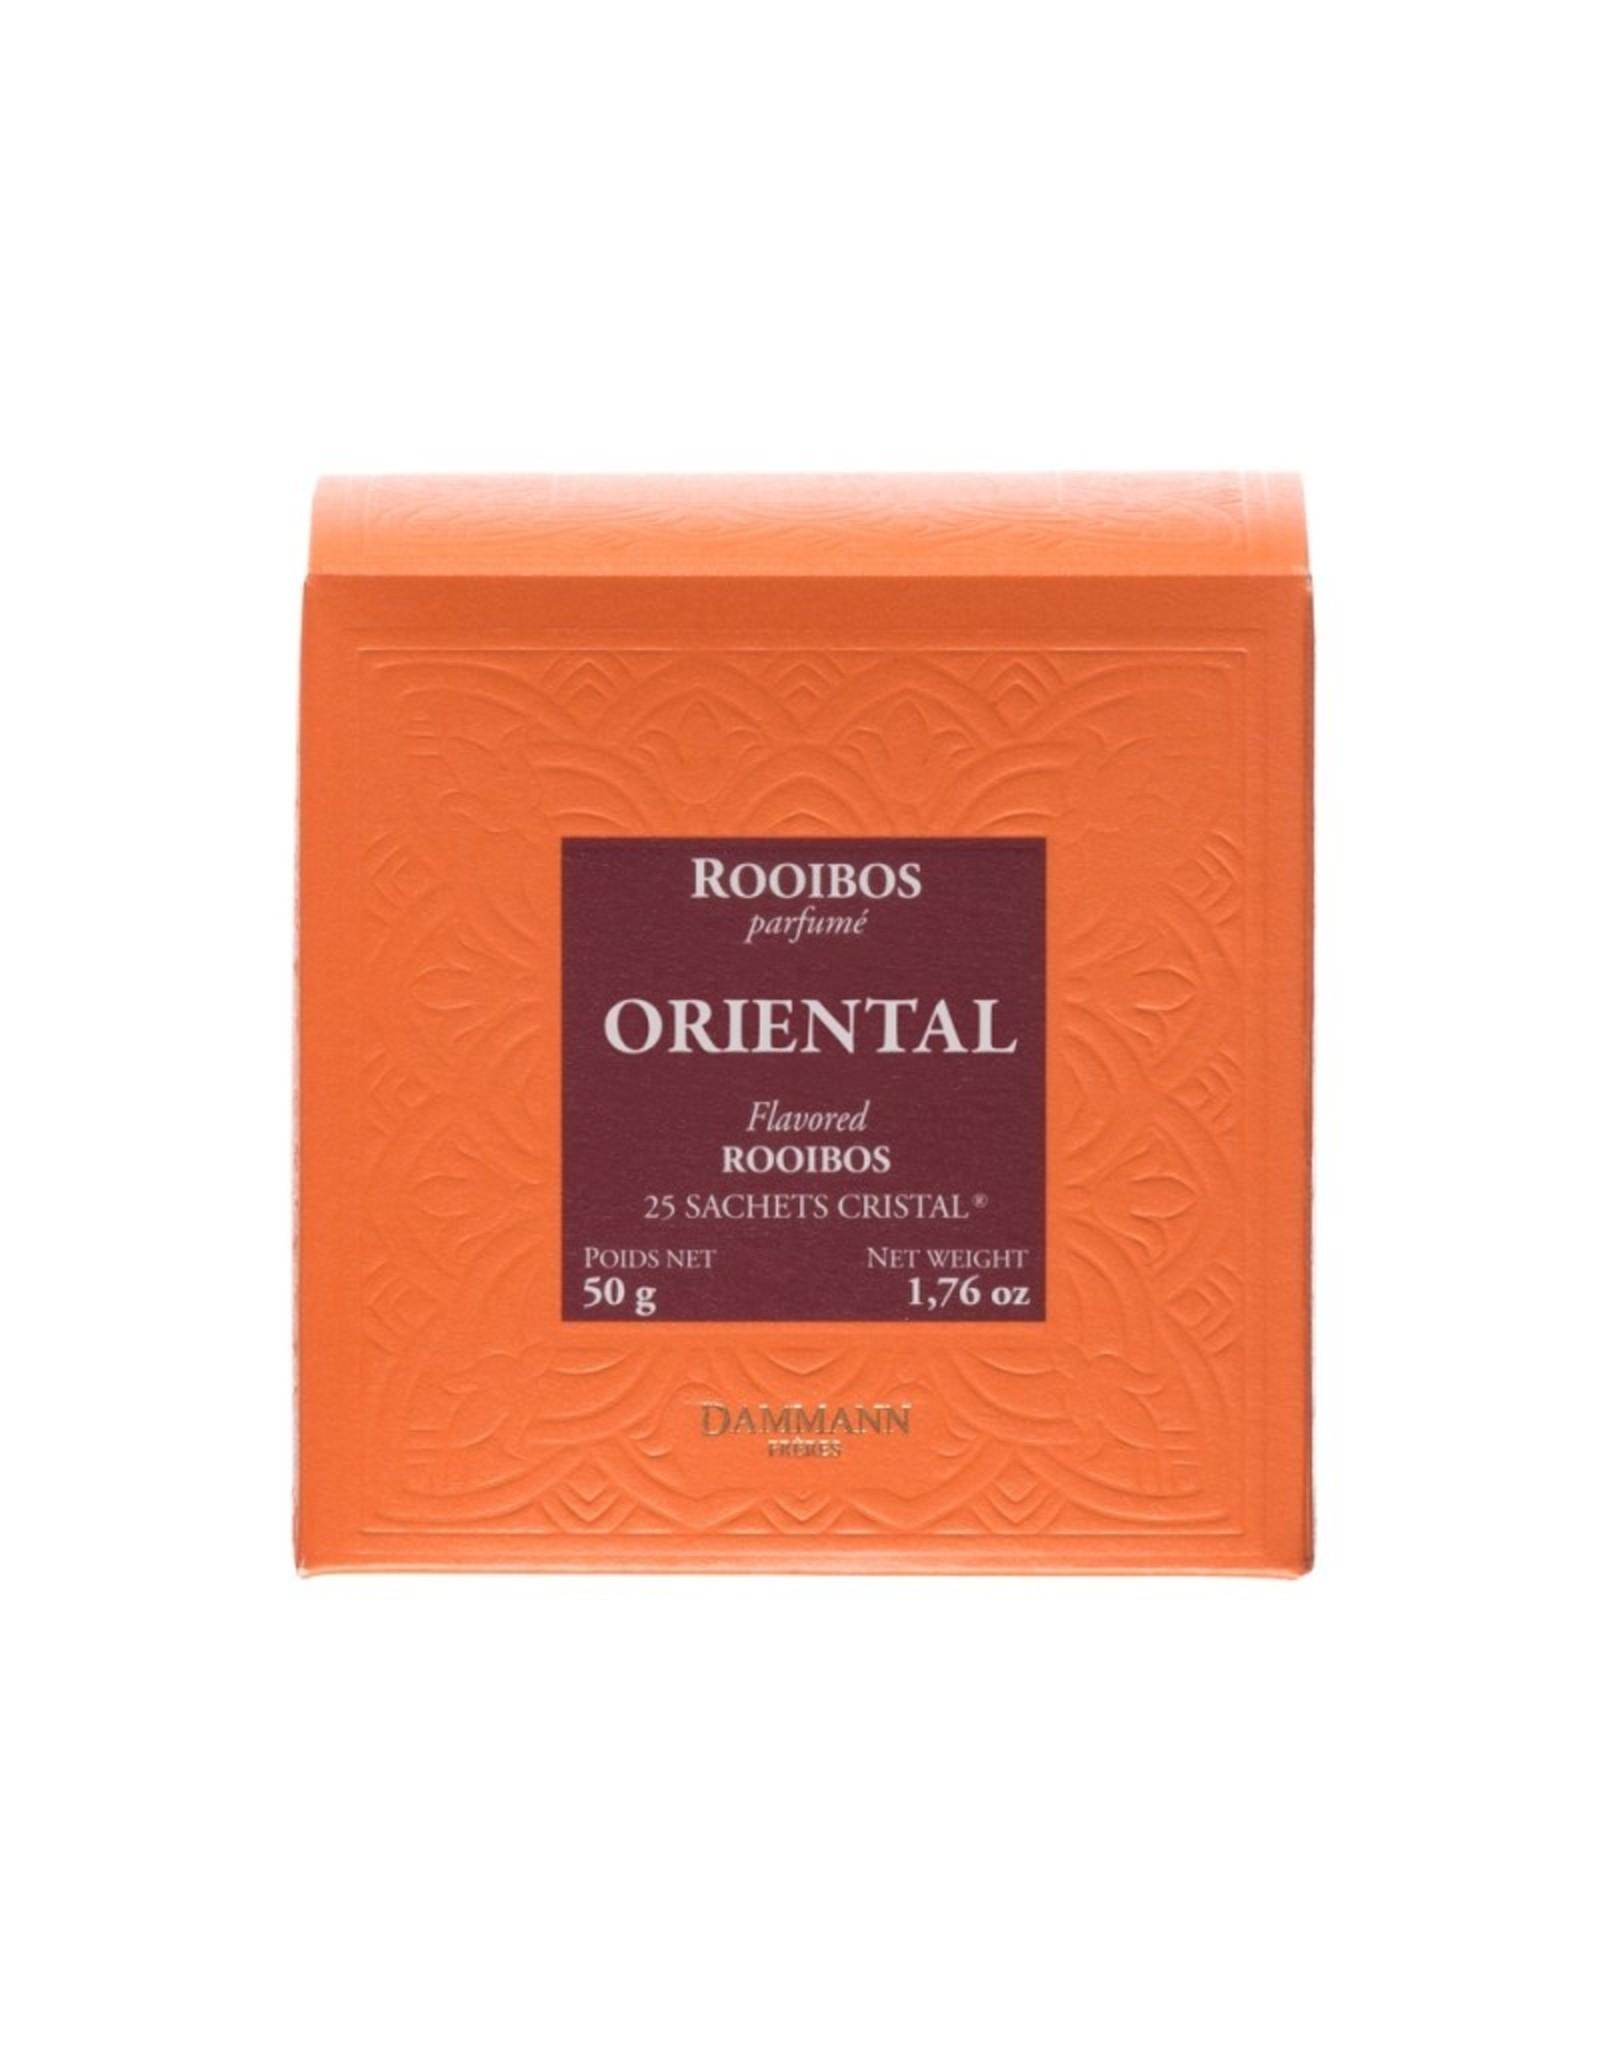 Dammann 'Oriental' Rooibos